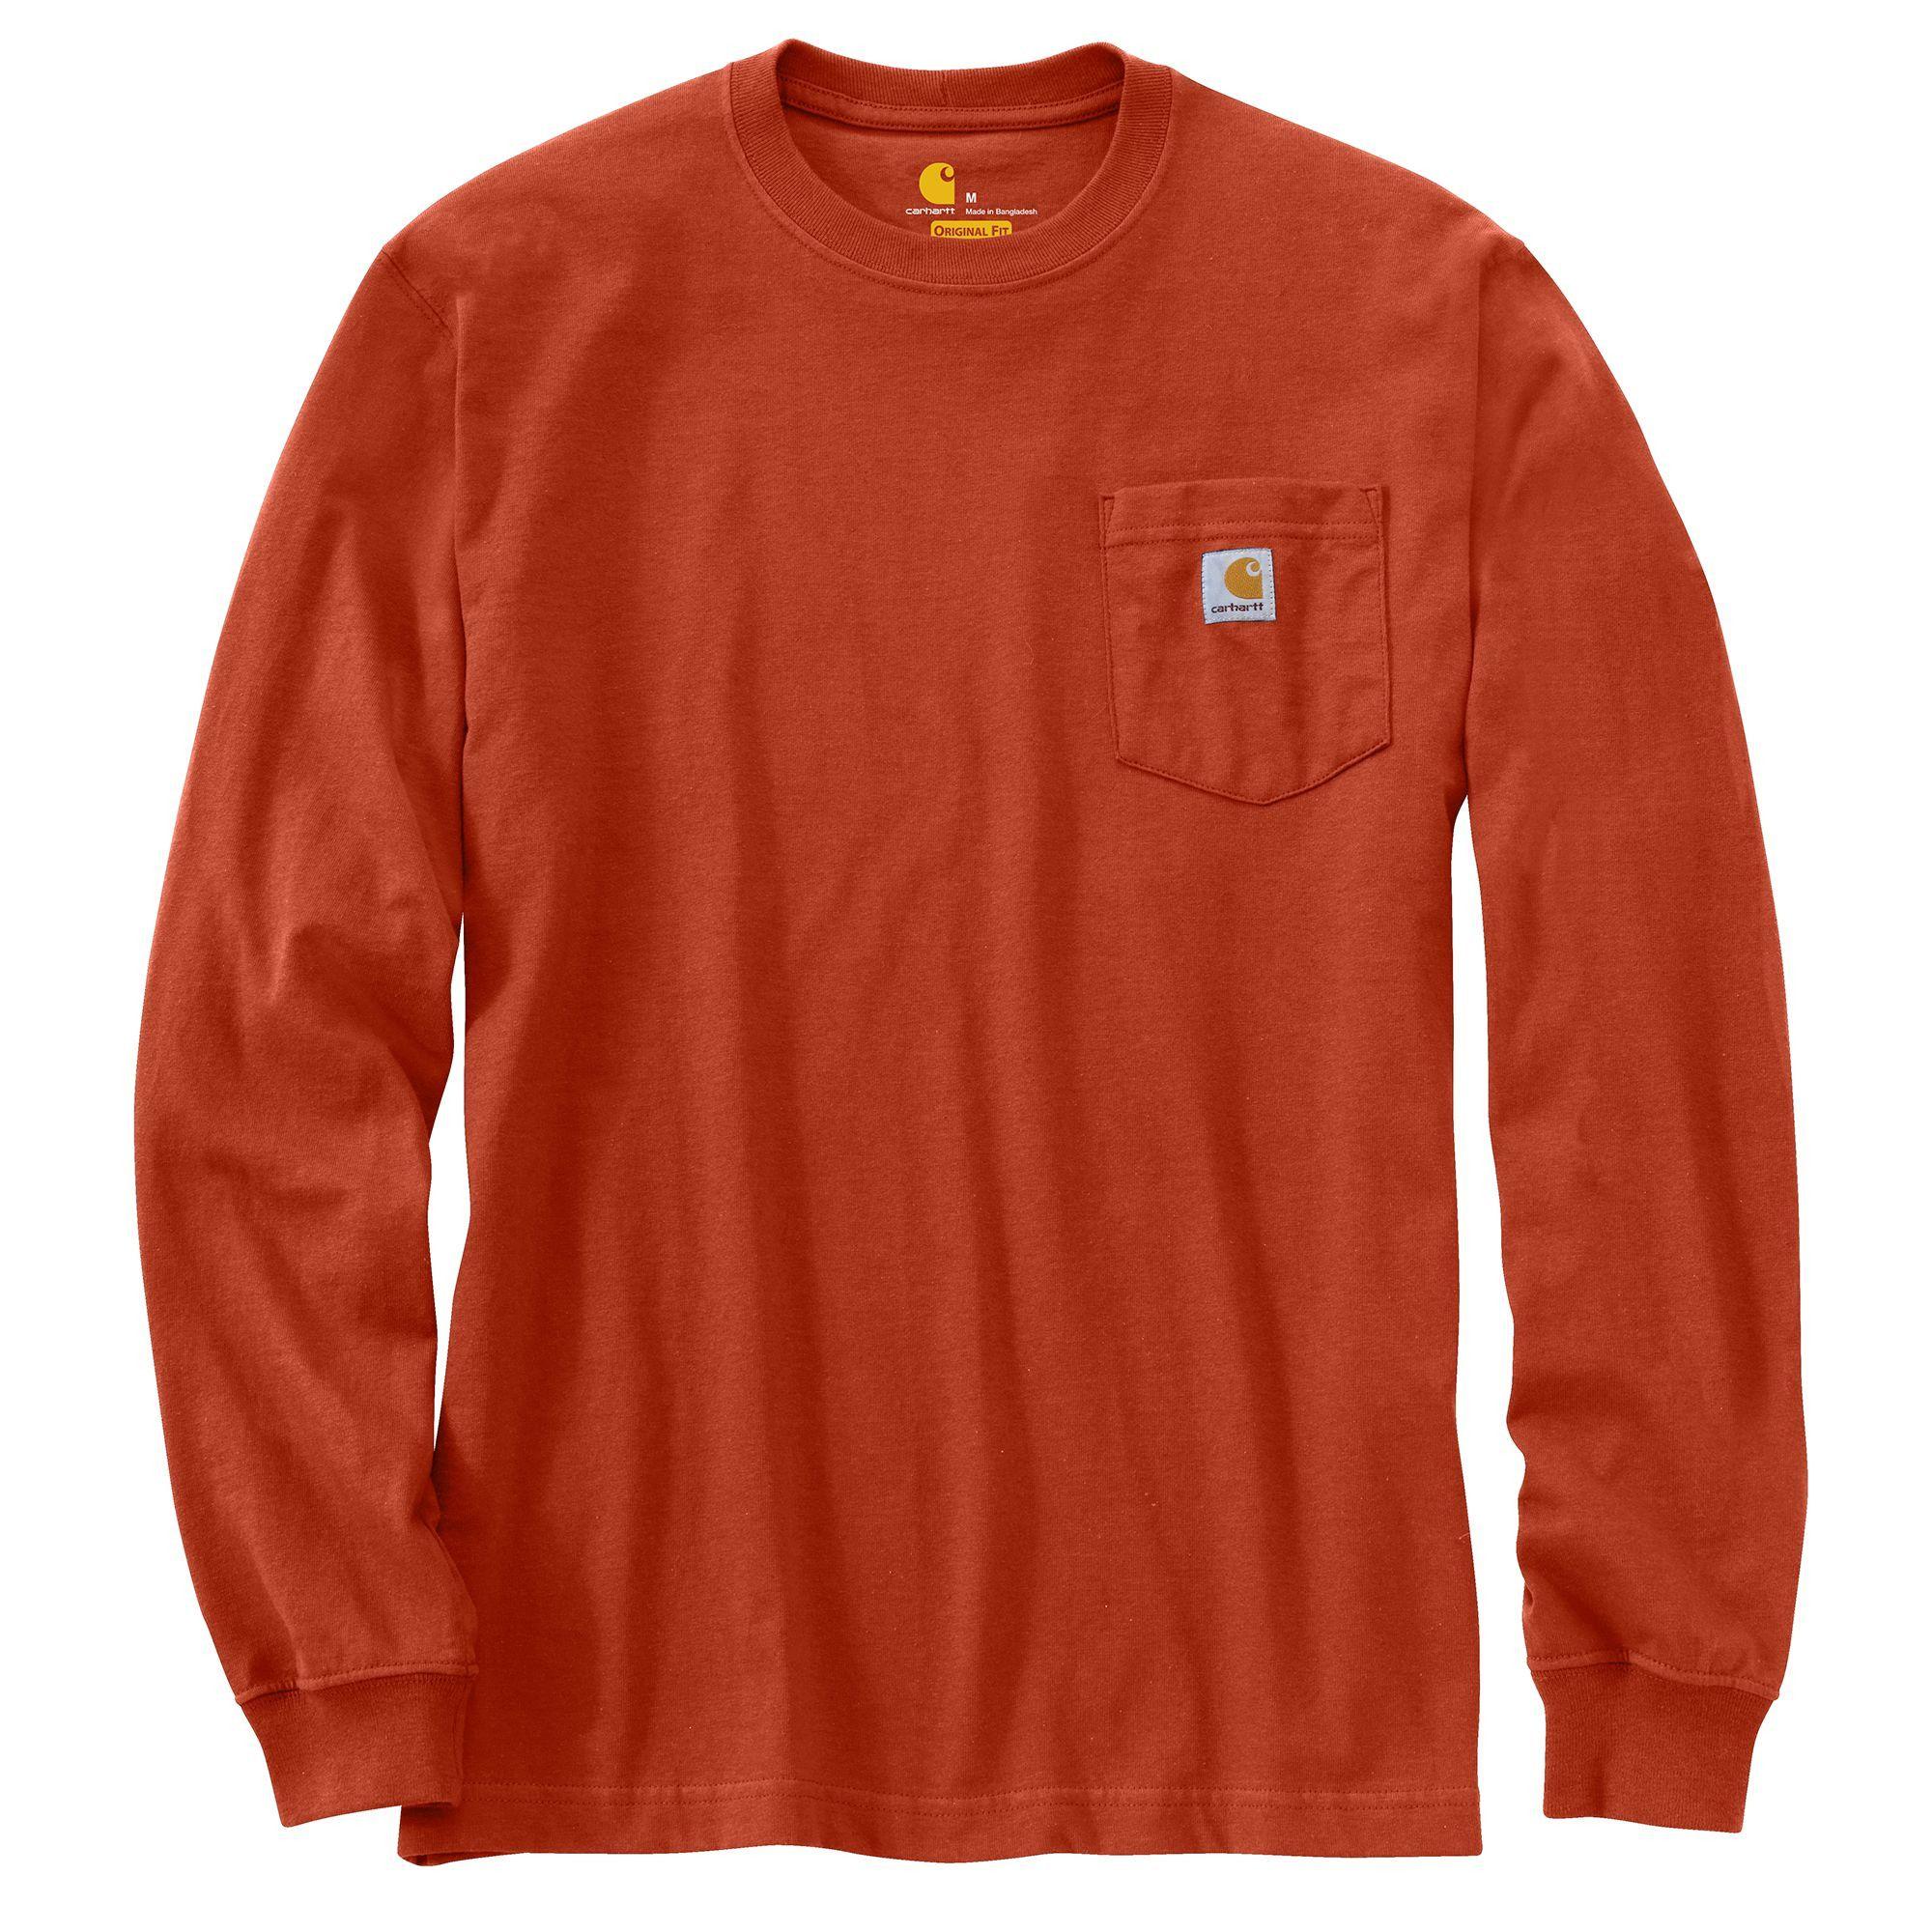 Carhartt Men/'s T-Shirt Workwear C-Logo Graphic Short-Sleeve S M L XL XXL